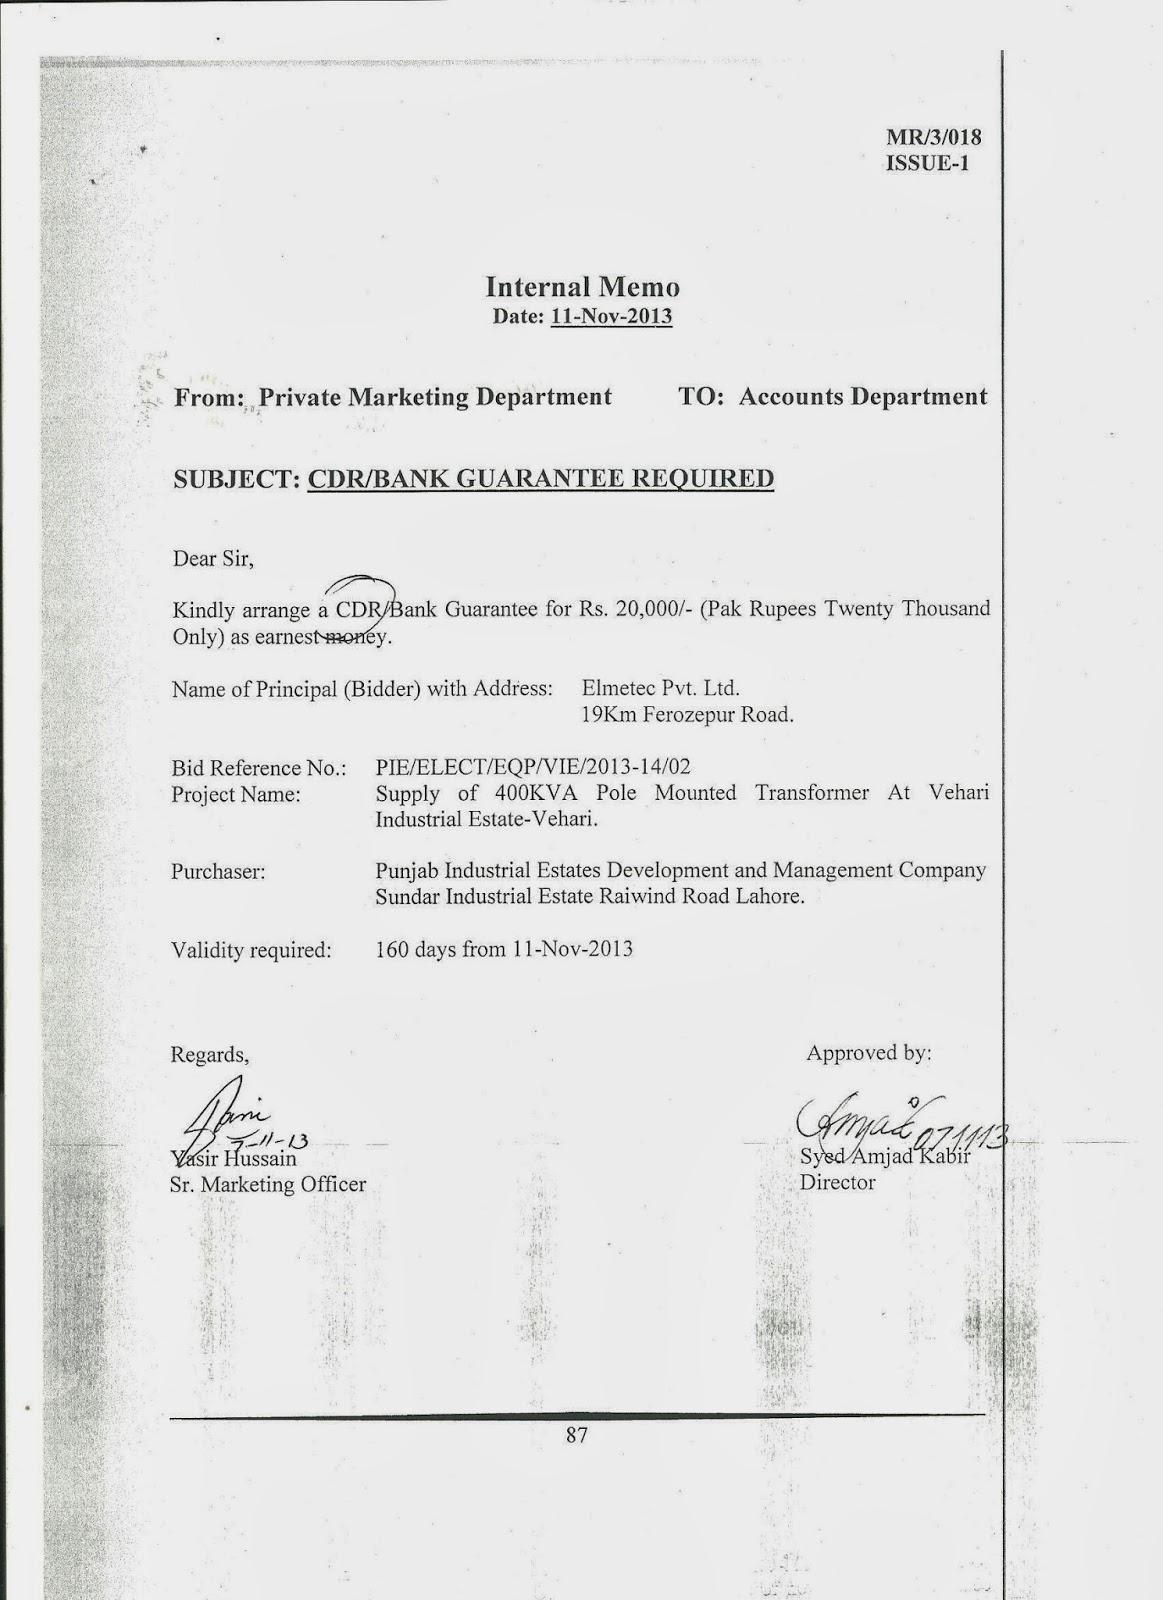 Internal Memo Format Letter DocumentsHub Com